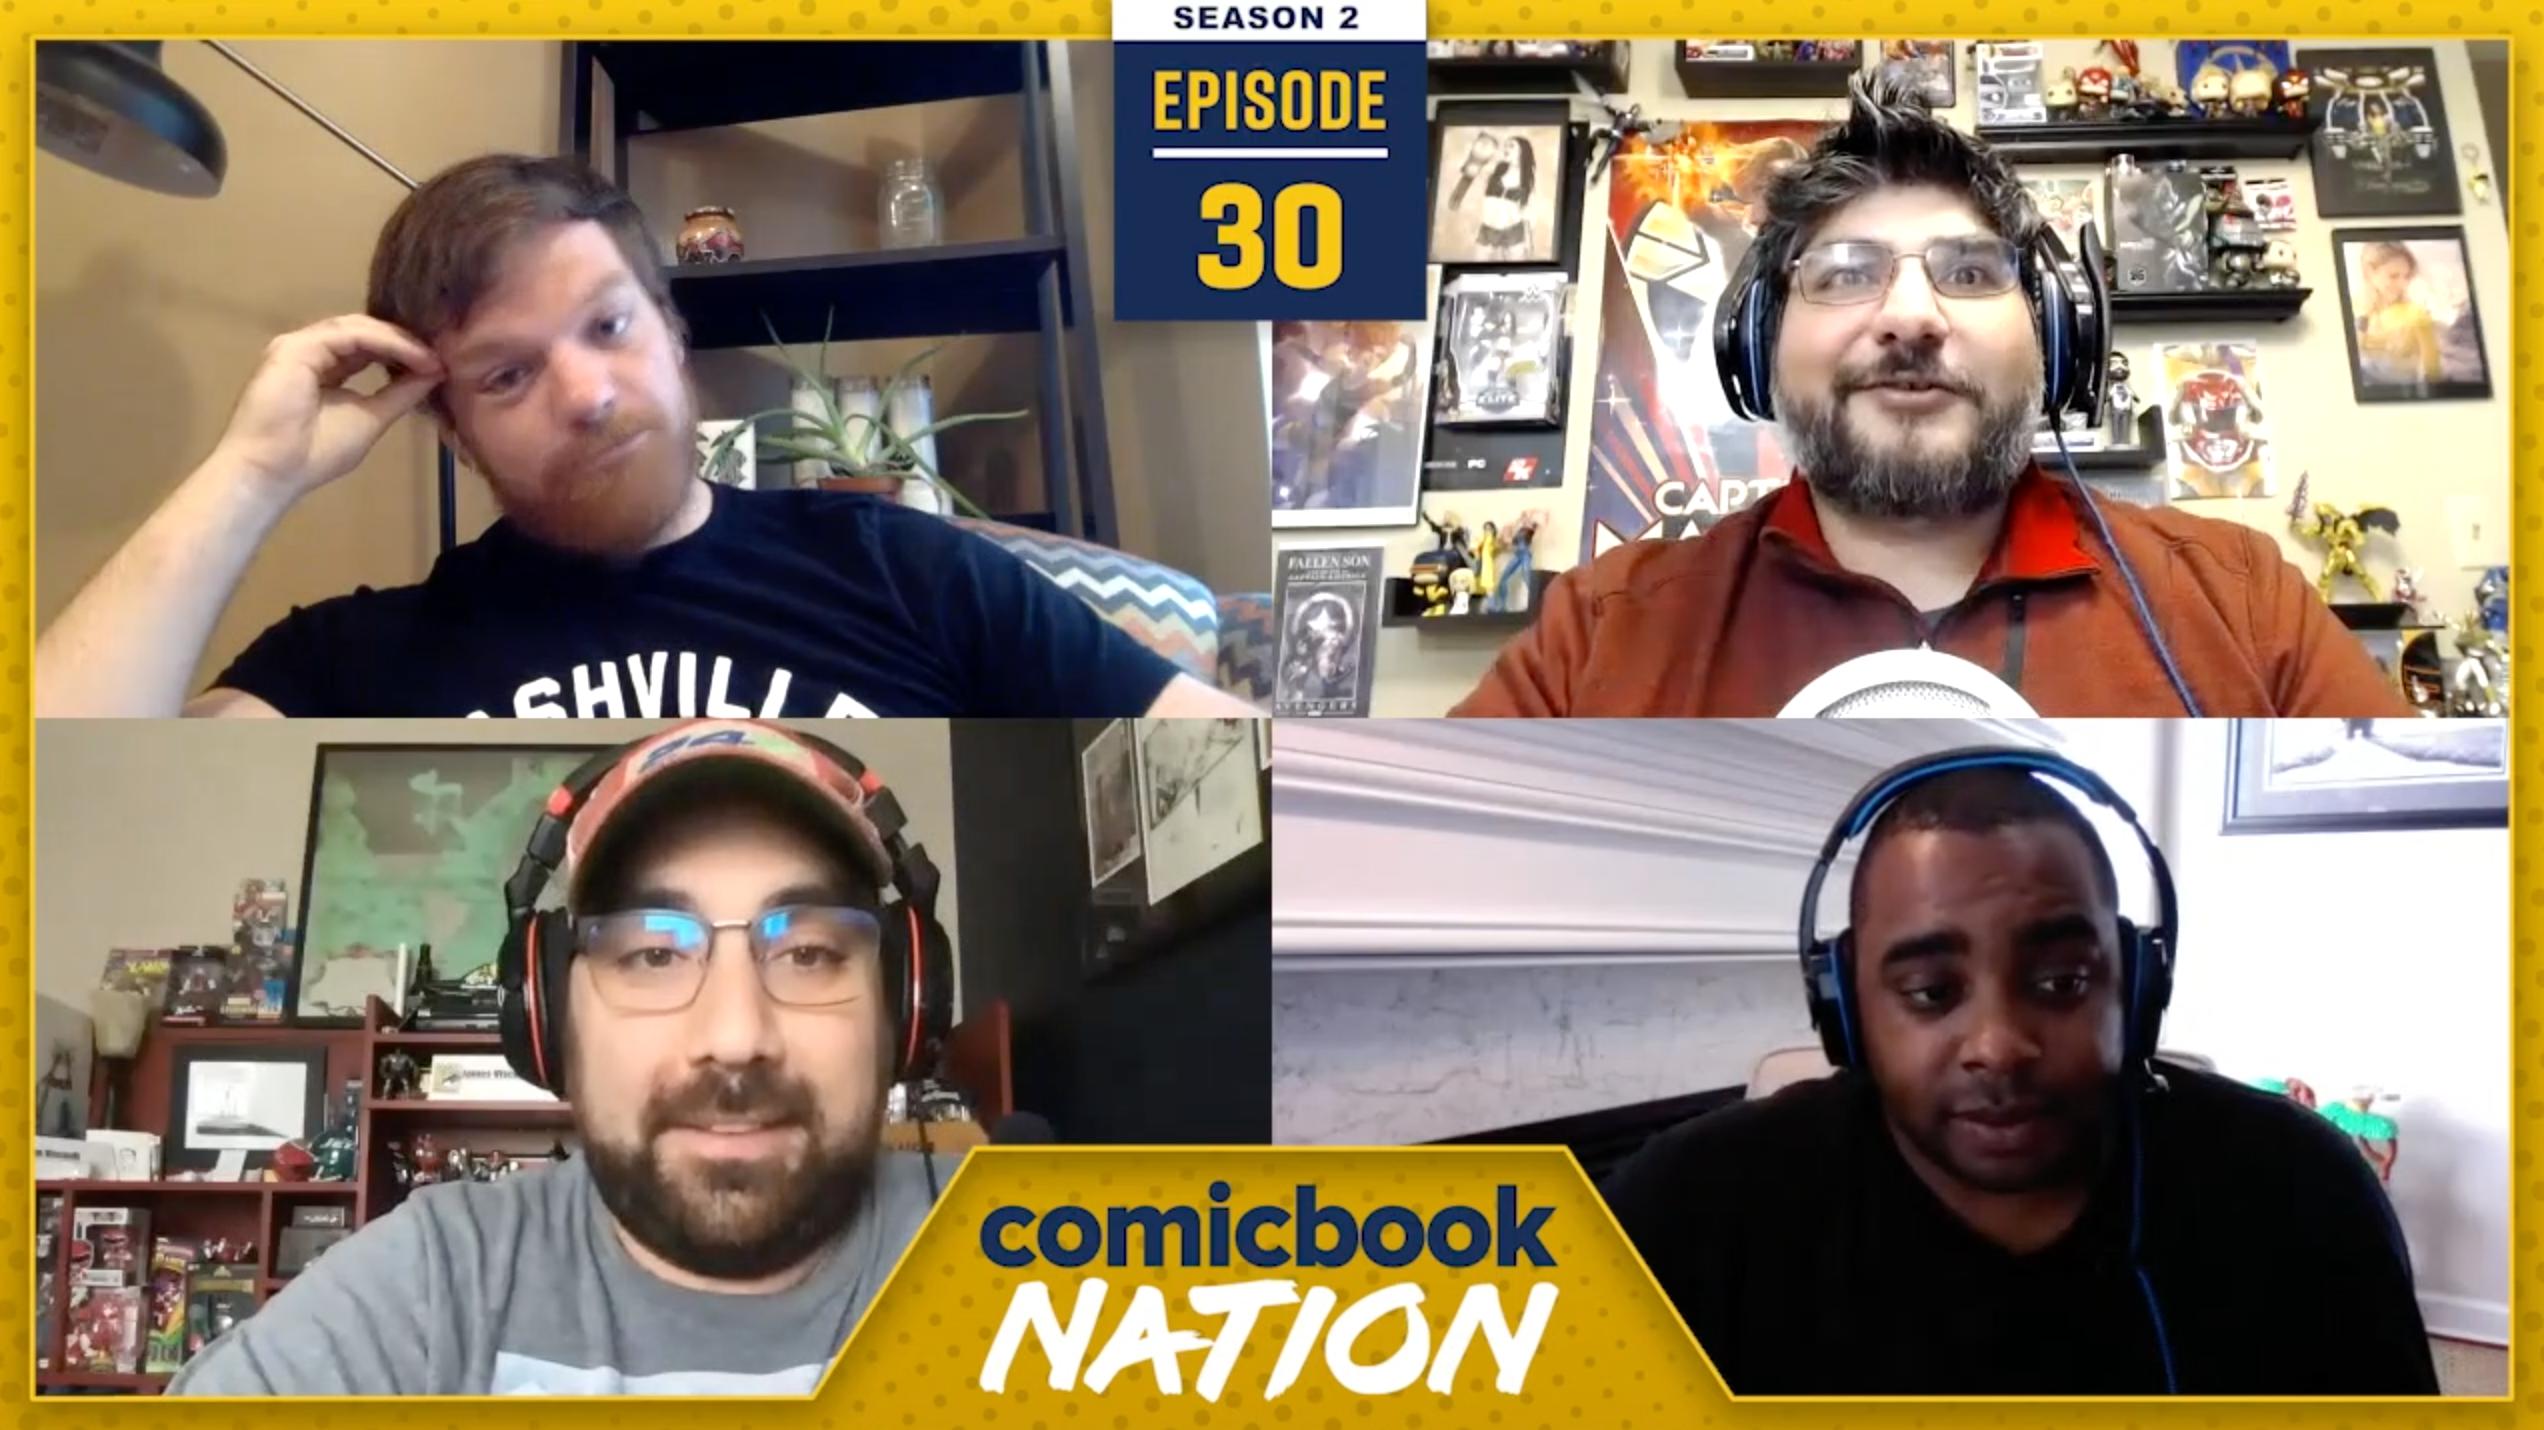 Marvel Secret Warriors rumored to be in development- Comicbook Nation Season 2 Ep. 30